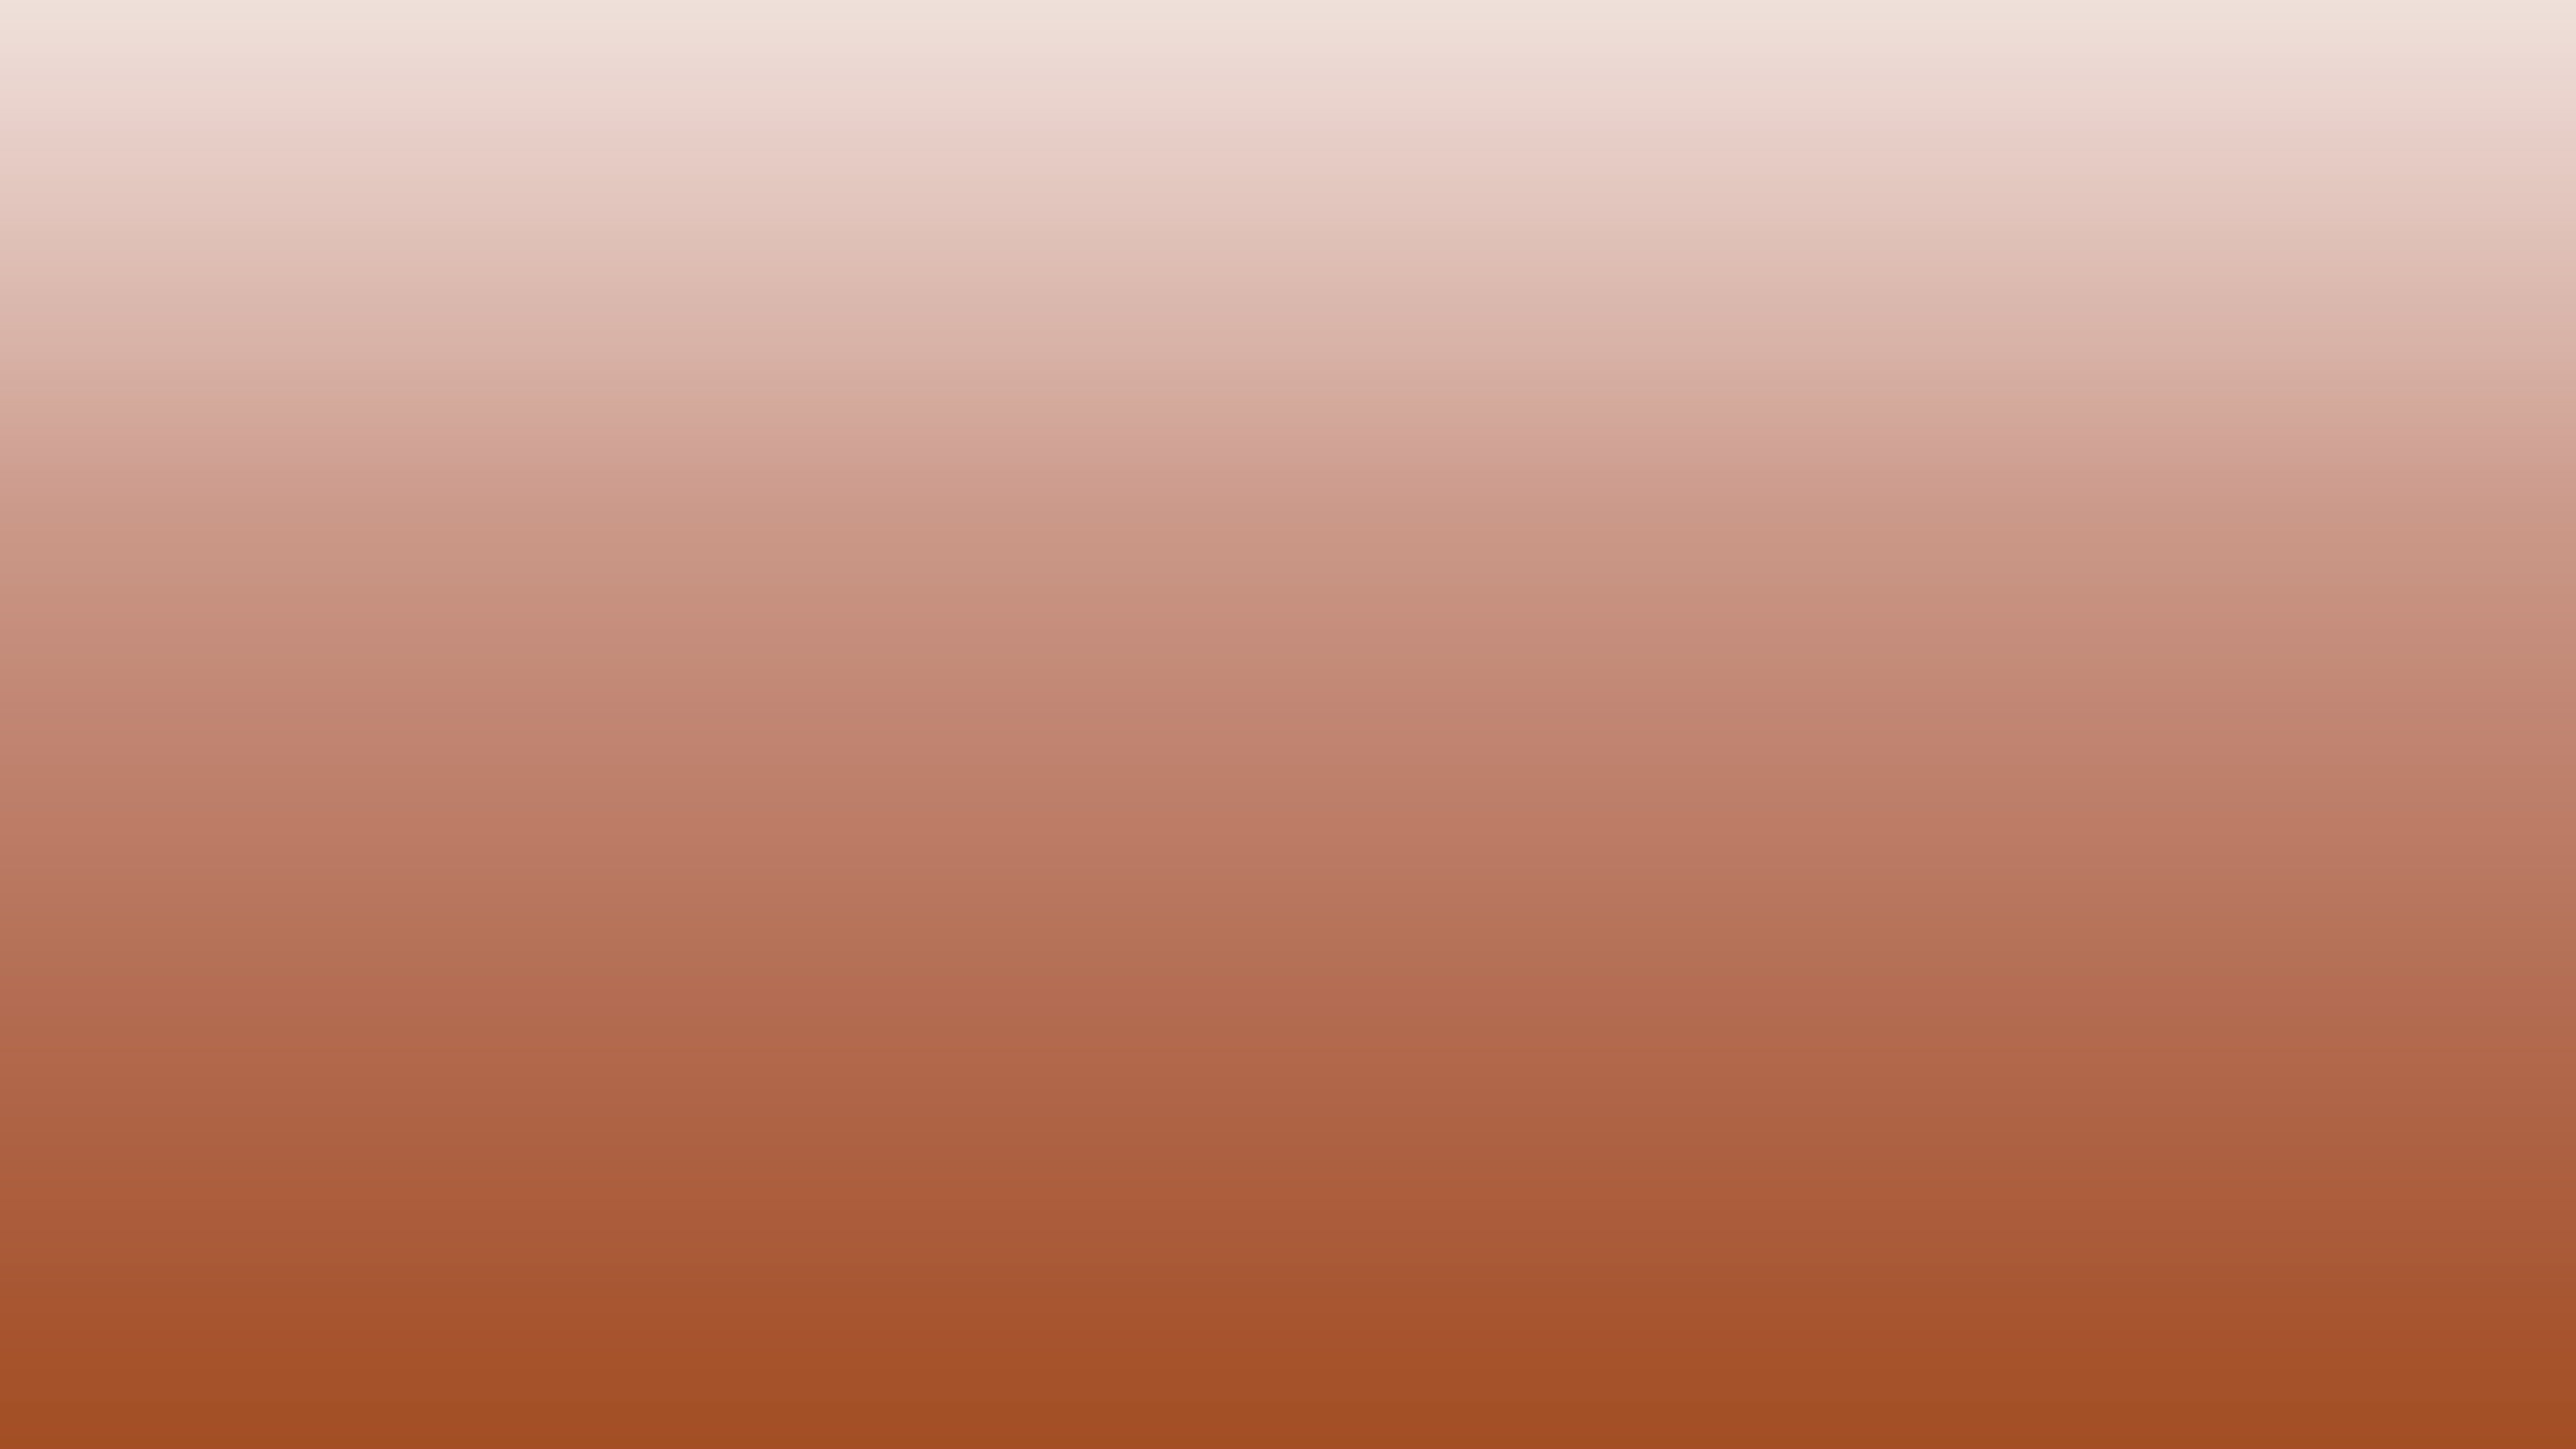 Wallpaper marrom Background marrom Plano de fundo marrom